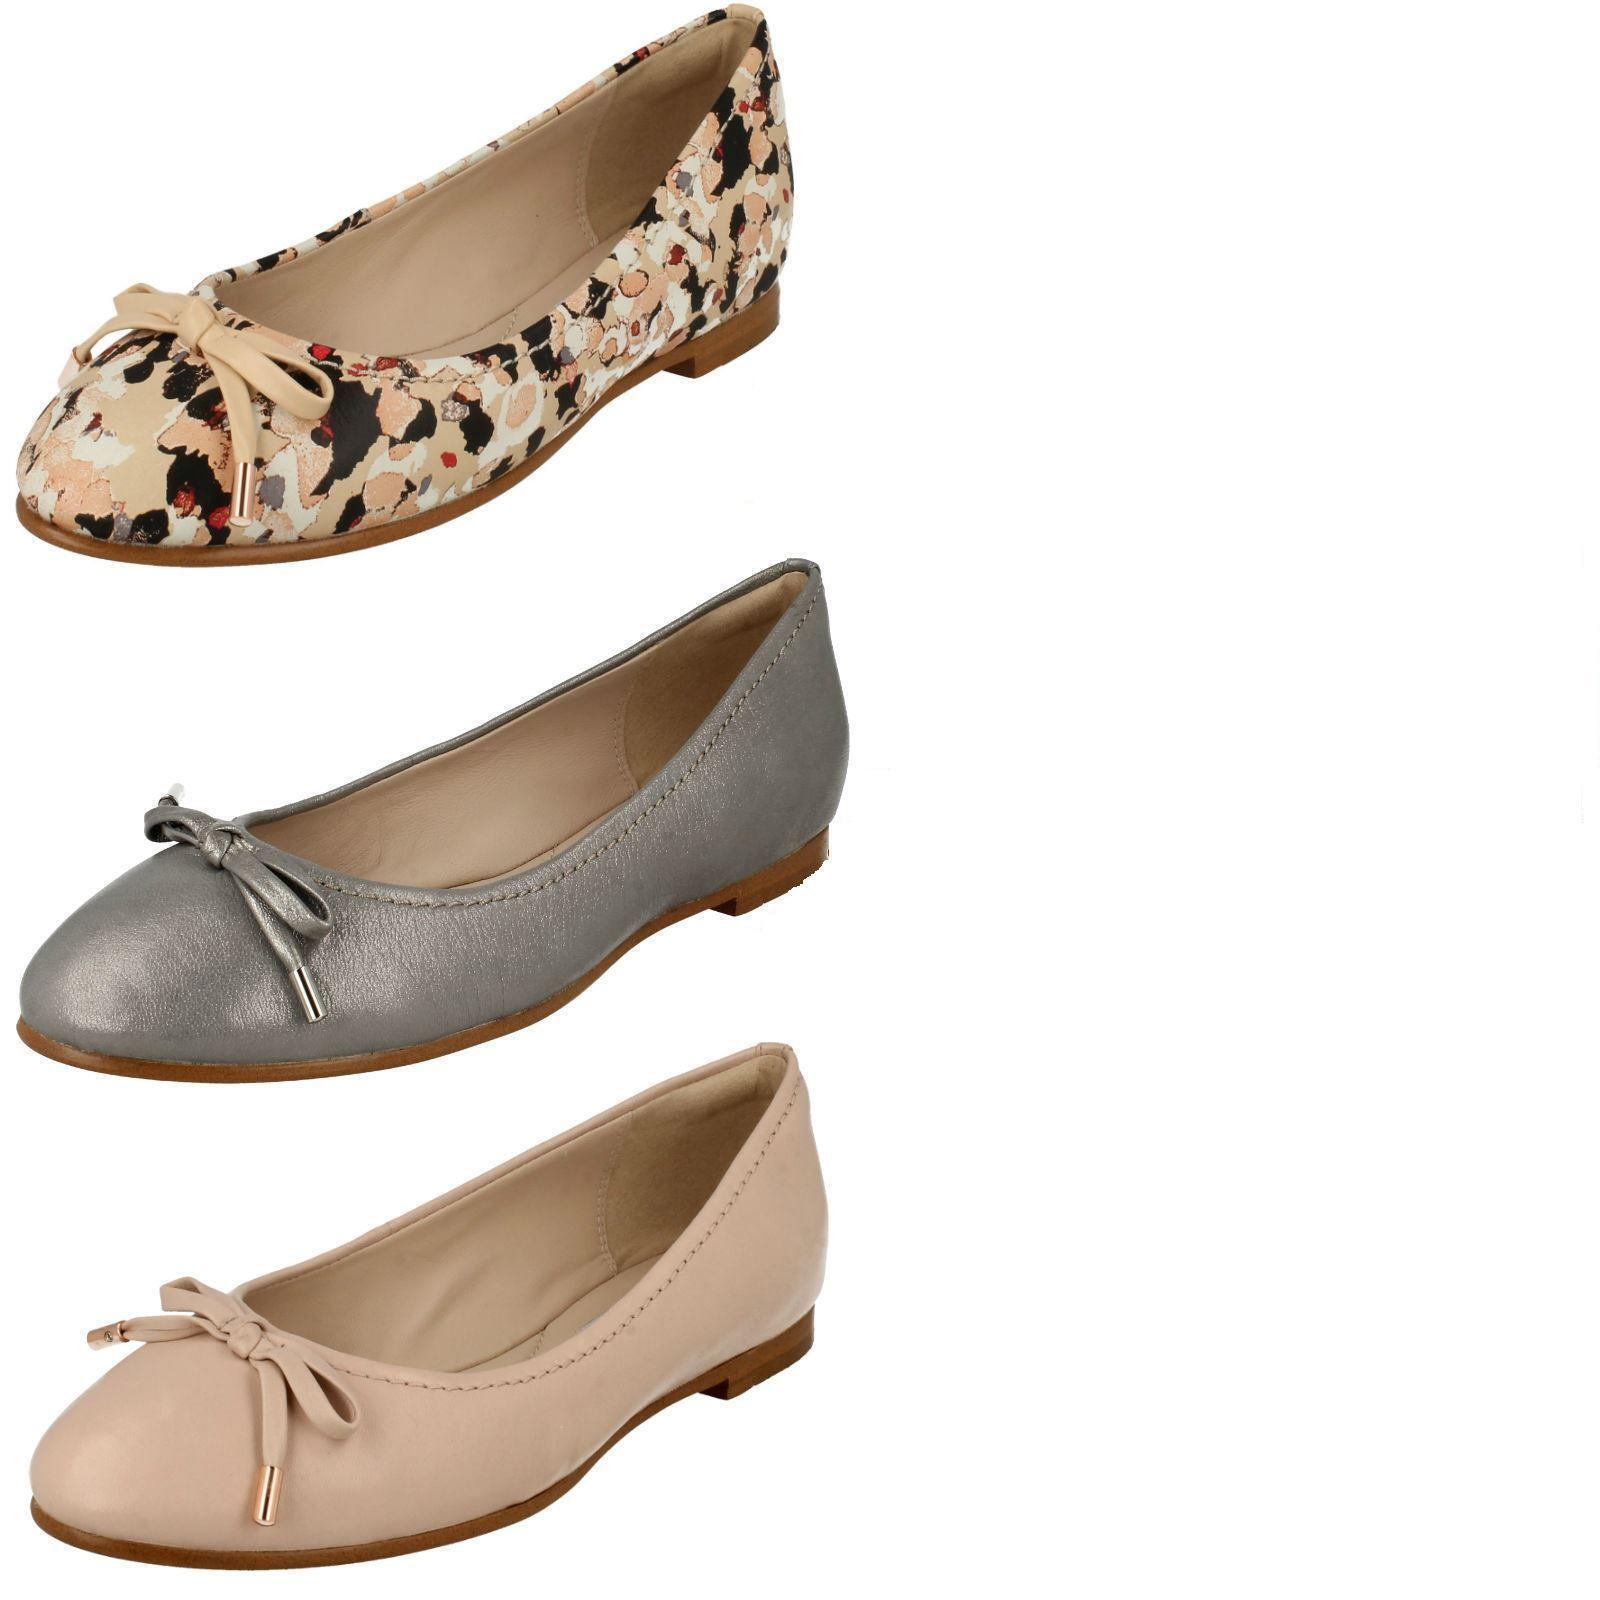 Clarks Damen Flache Ballerinas& 039; Gnade Lilie & 039;